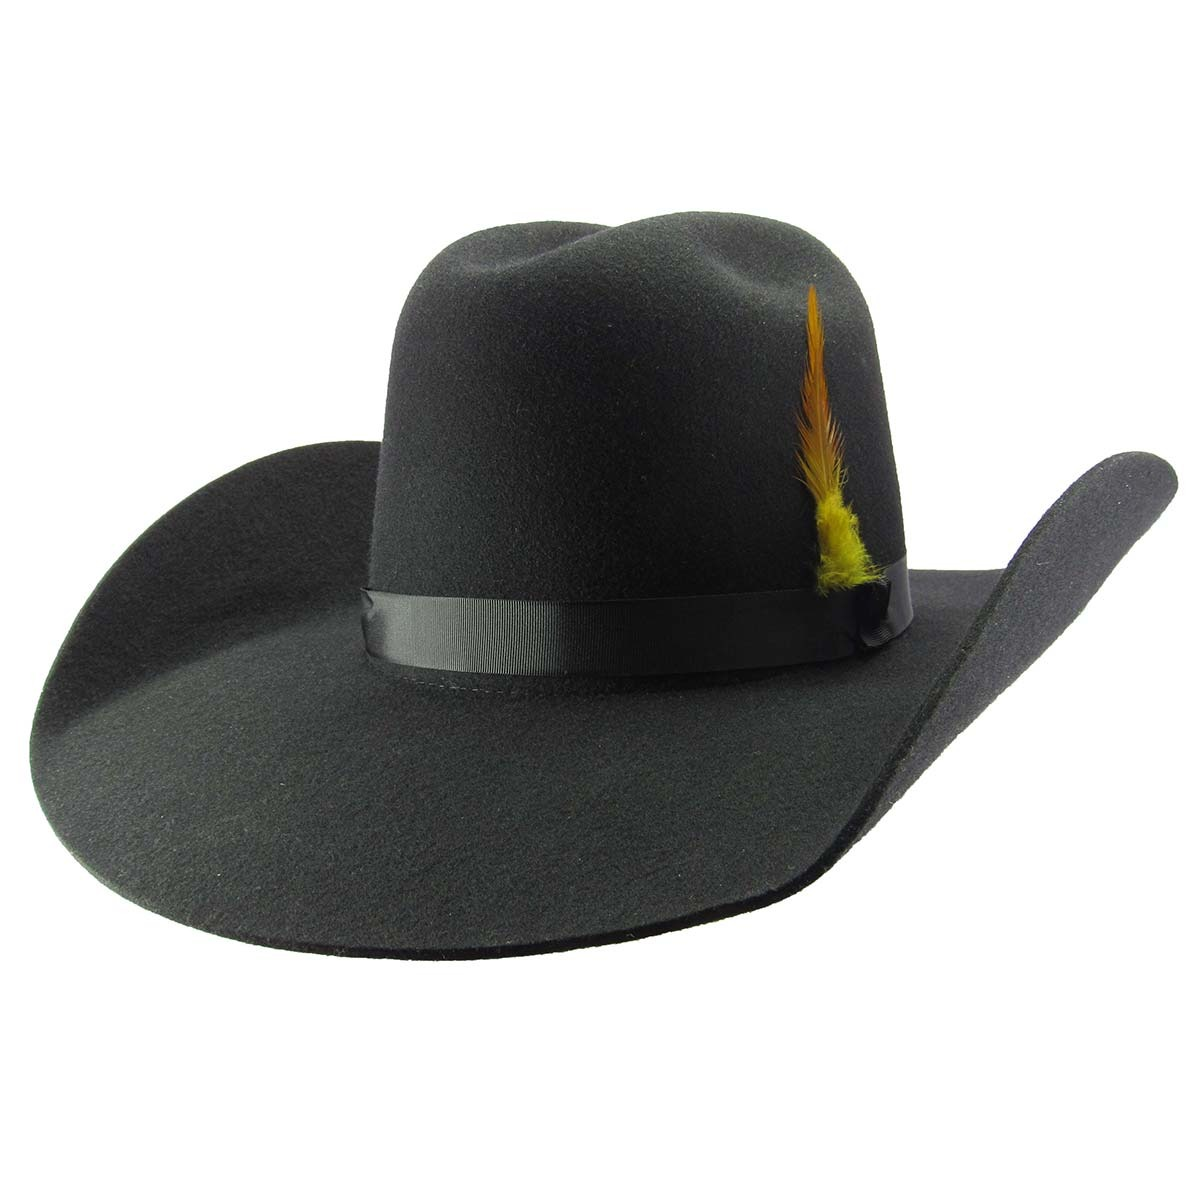 391b97d9bbc82 chapéu pralana feltro preto old west country aba 11 - 99833. Carregando  zoom.